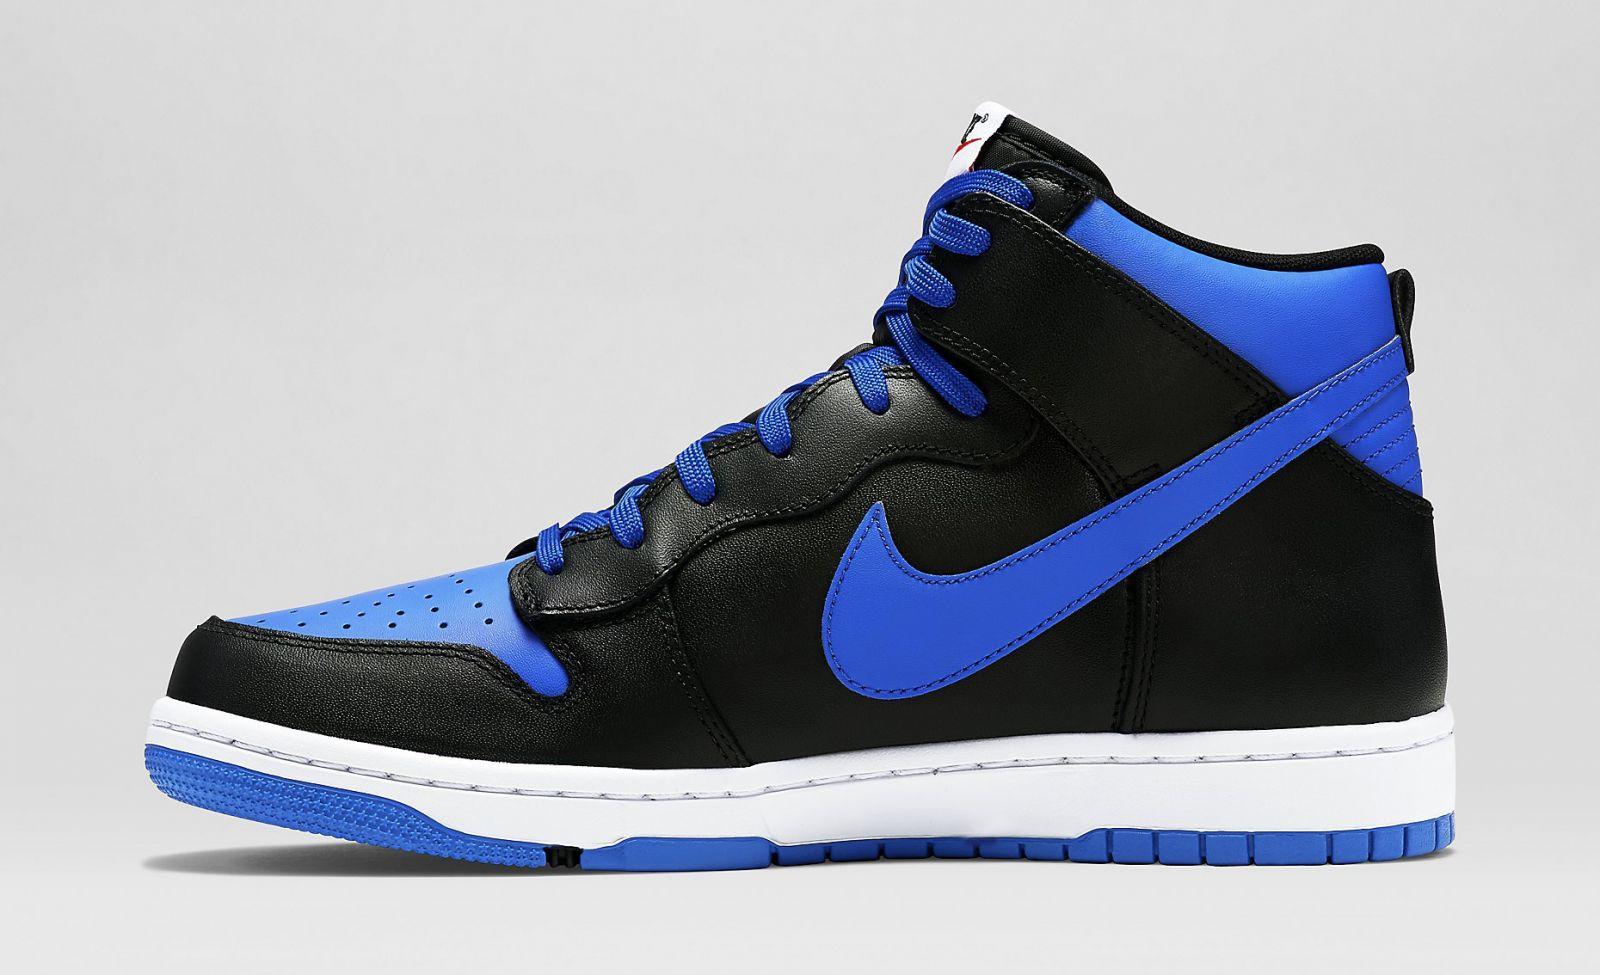 nike dunk cmft color: lyon blue/black style #: 705434-400. price: $100 NVNFORD